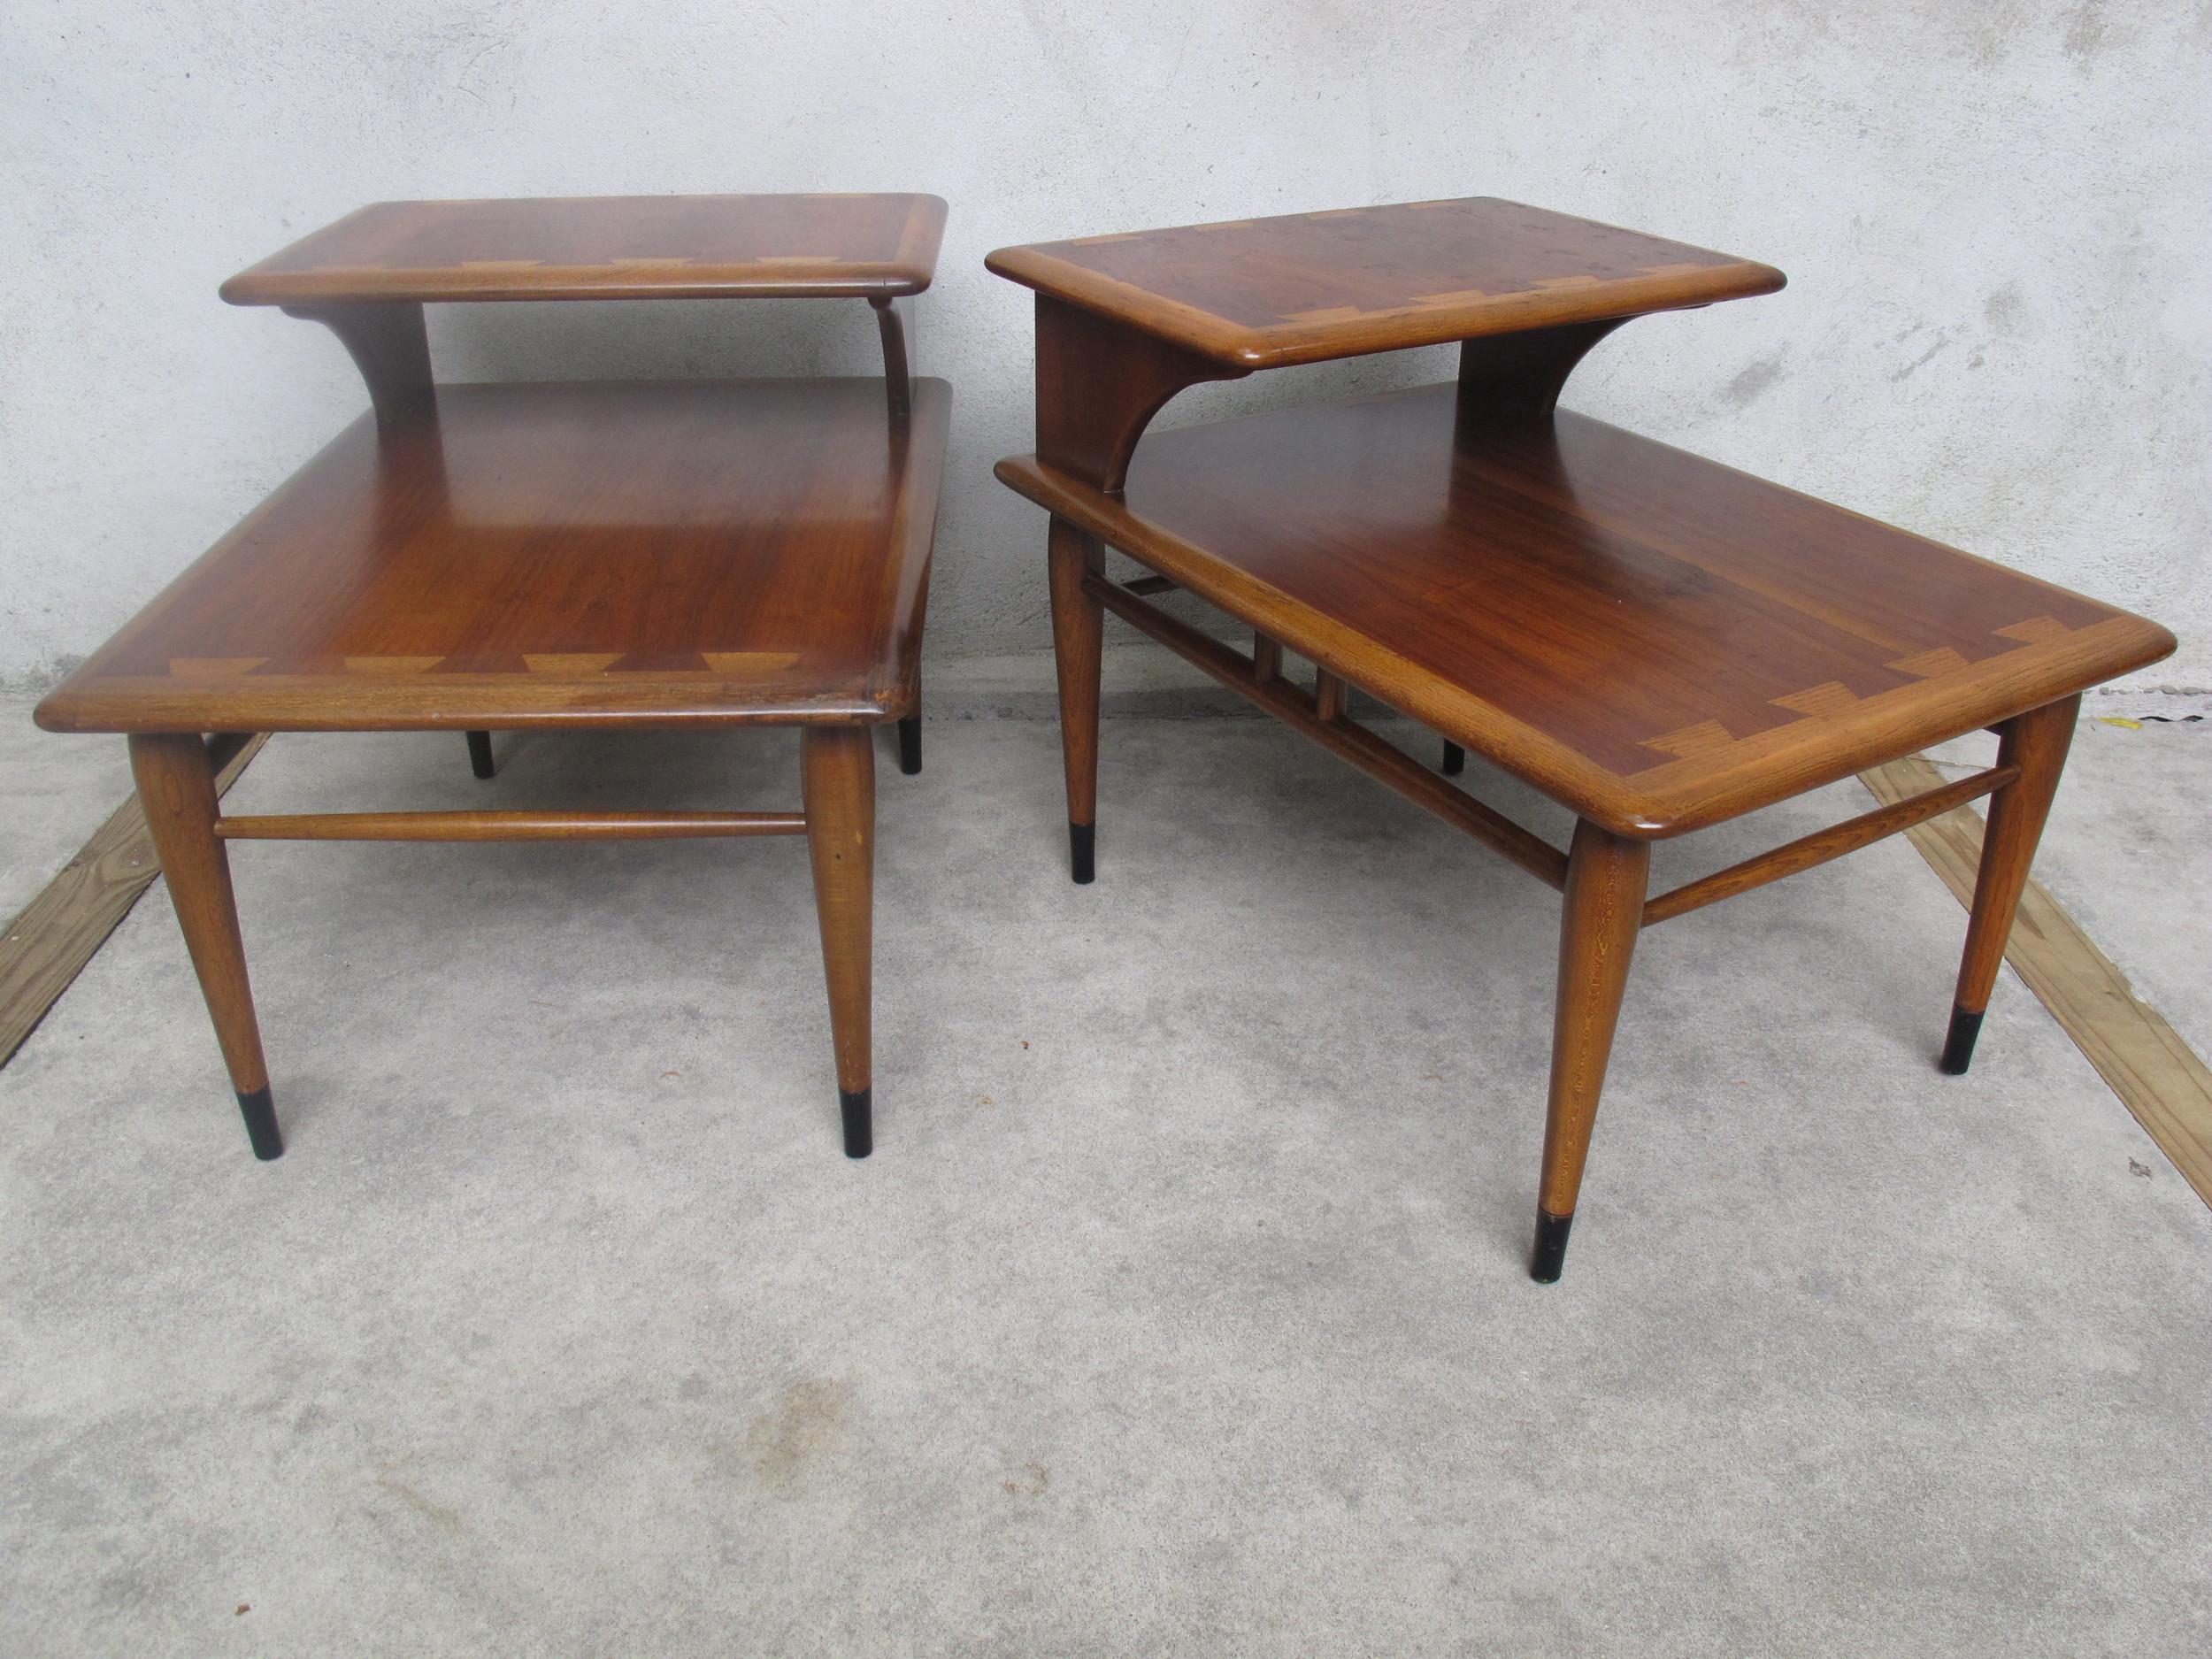 MID CENTURY LANE ACCLAIM END TABLES